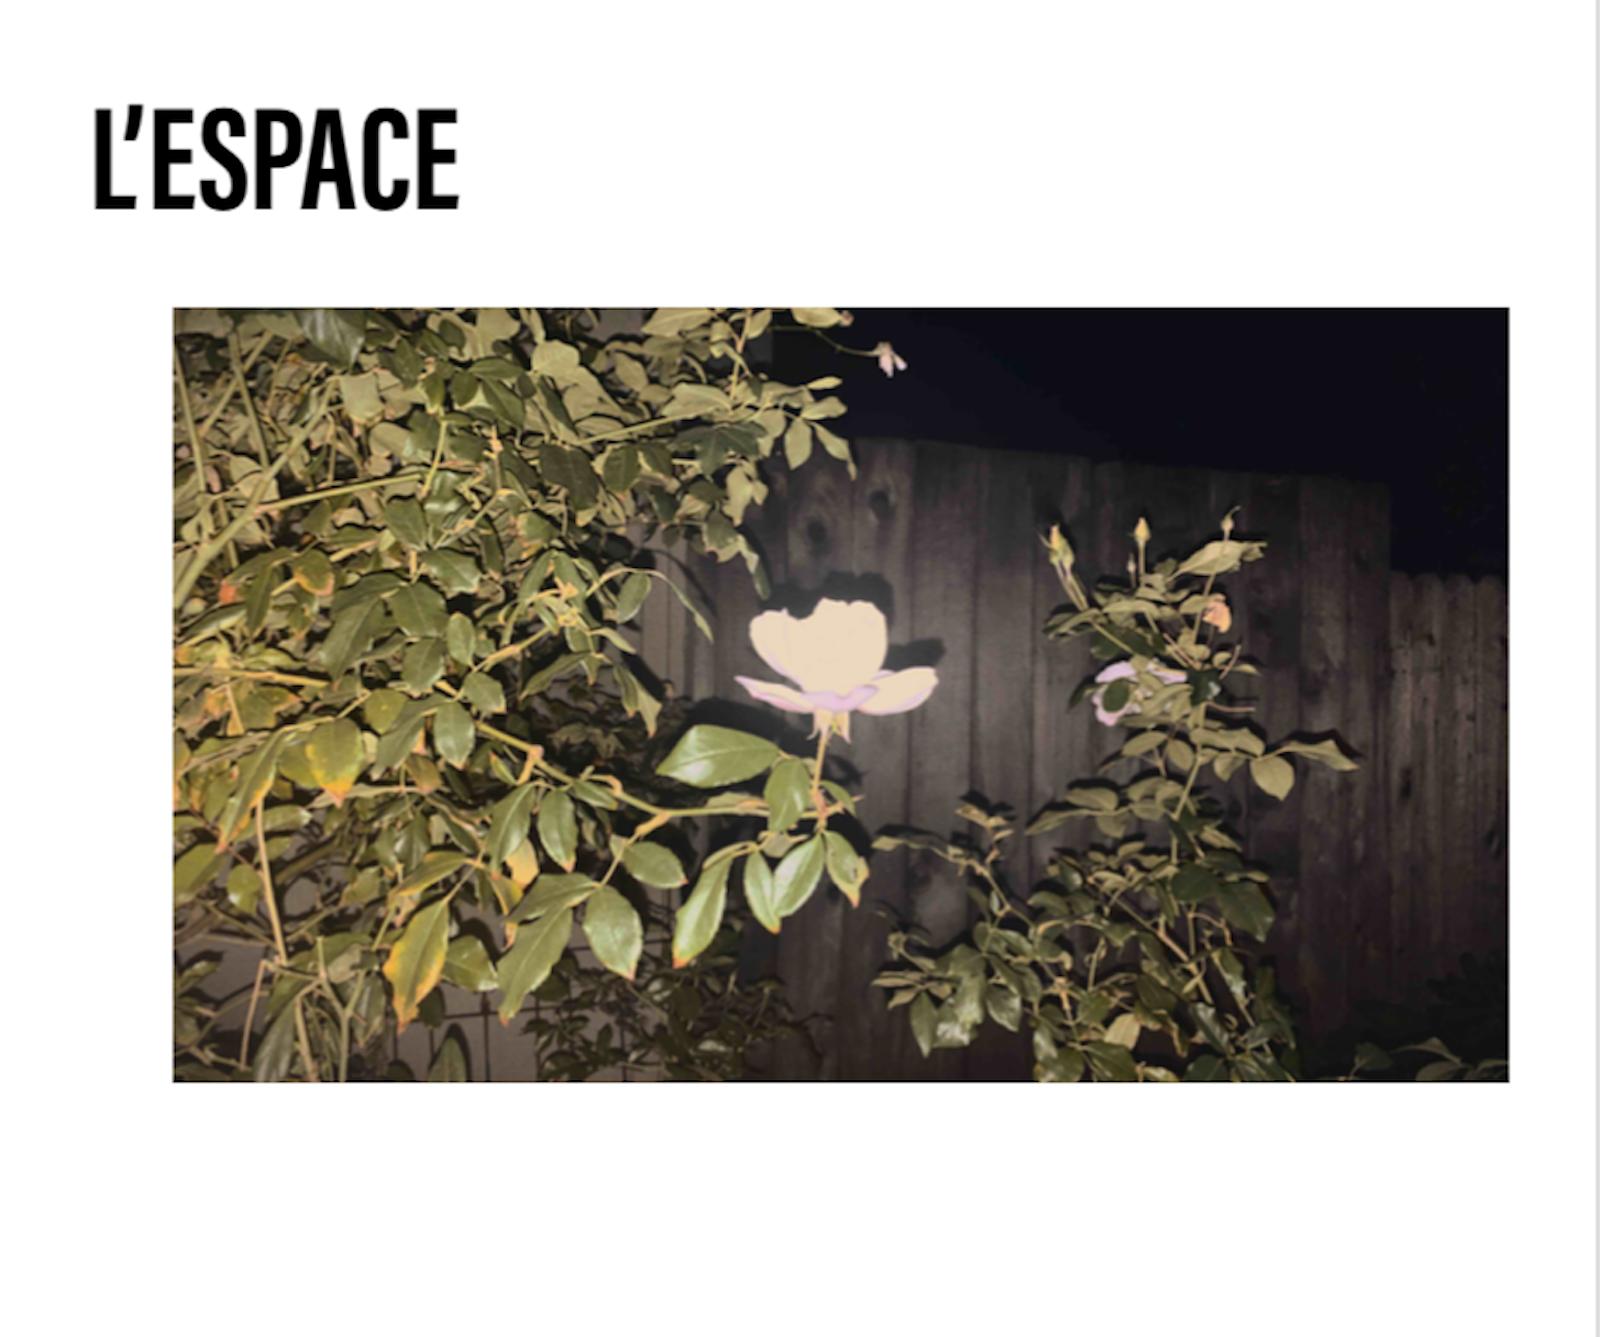 L'Espace - Kailyn Chadwick